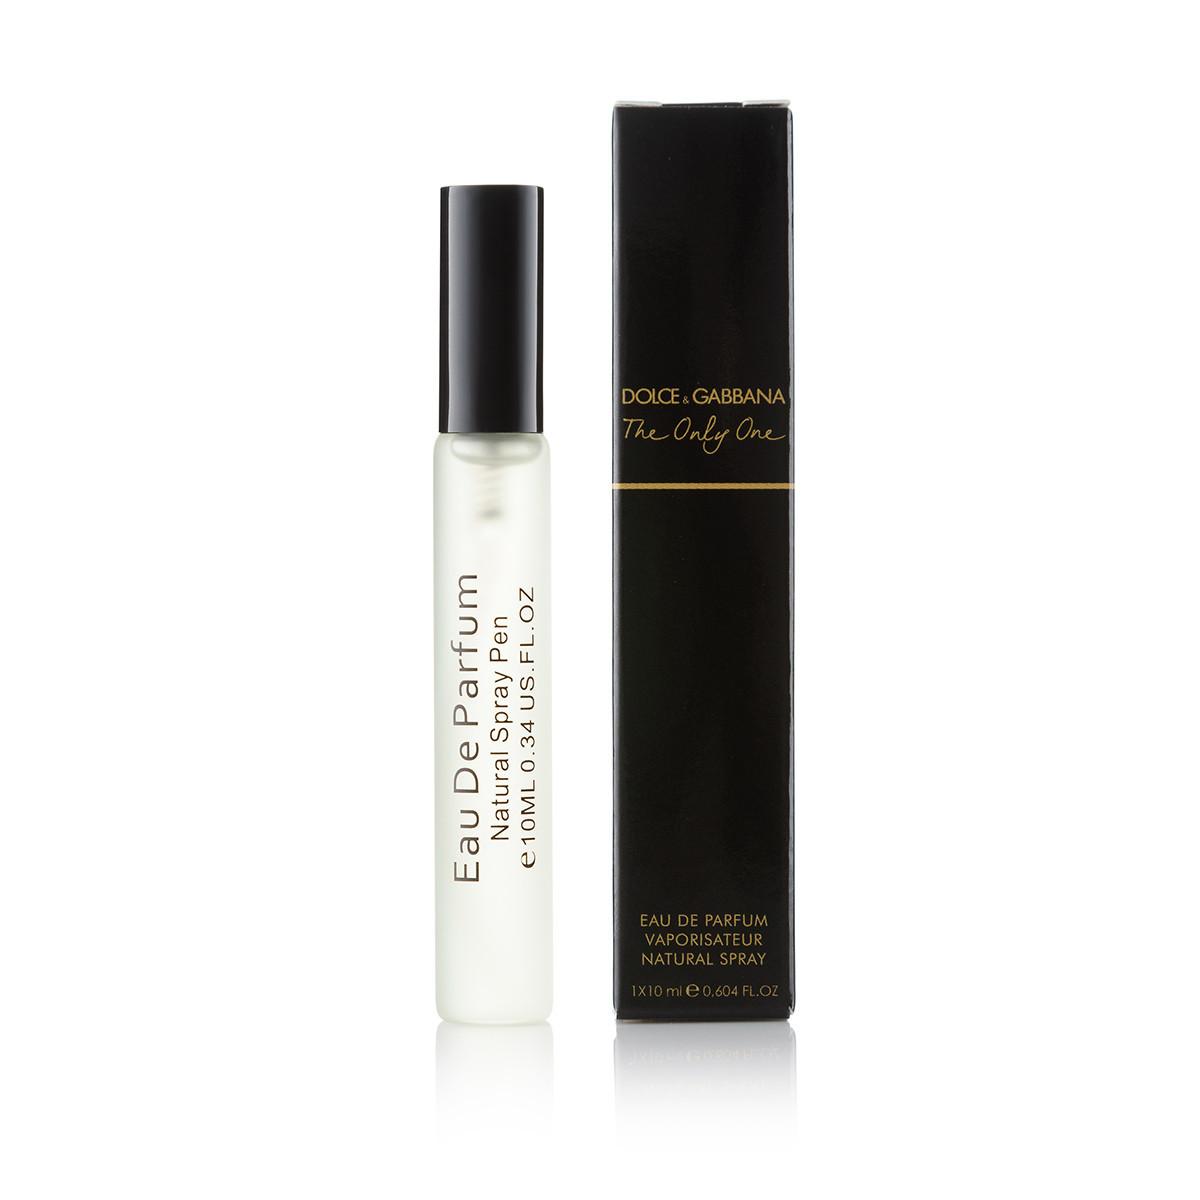 10 мл парфюм миниатюра в ручке Dolce&Gabbana The Only One (Ж) Д-31